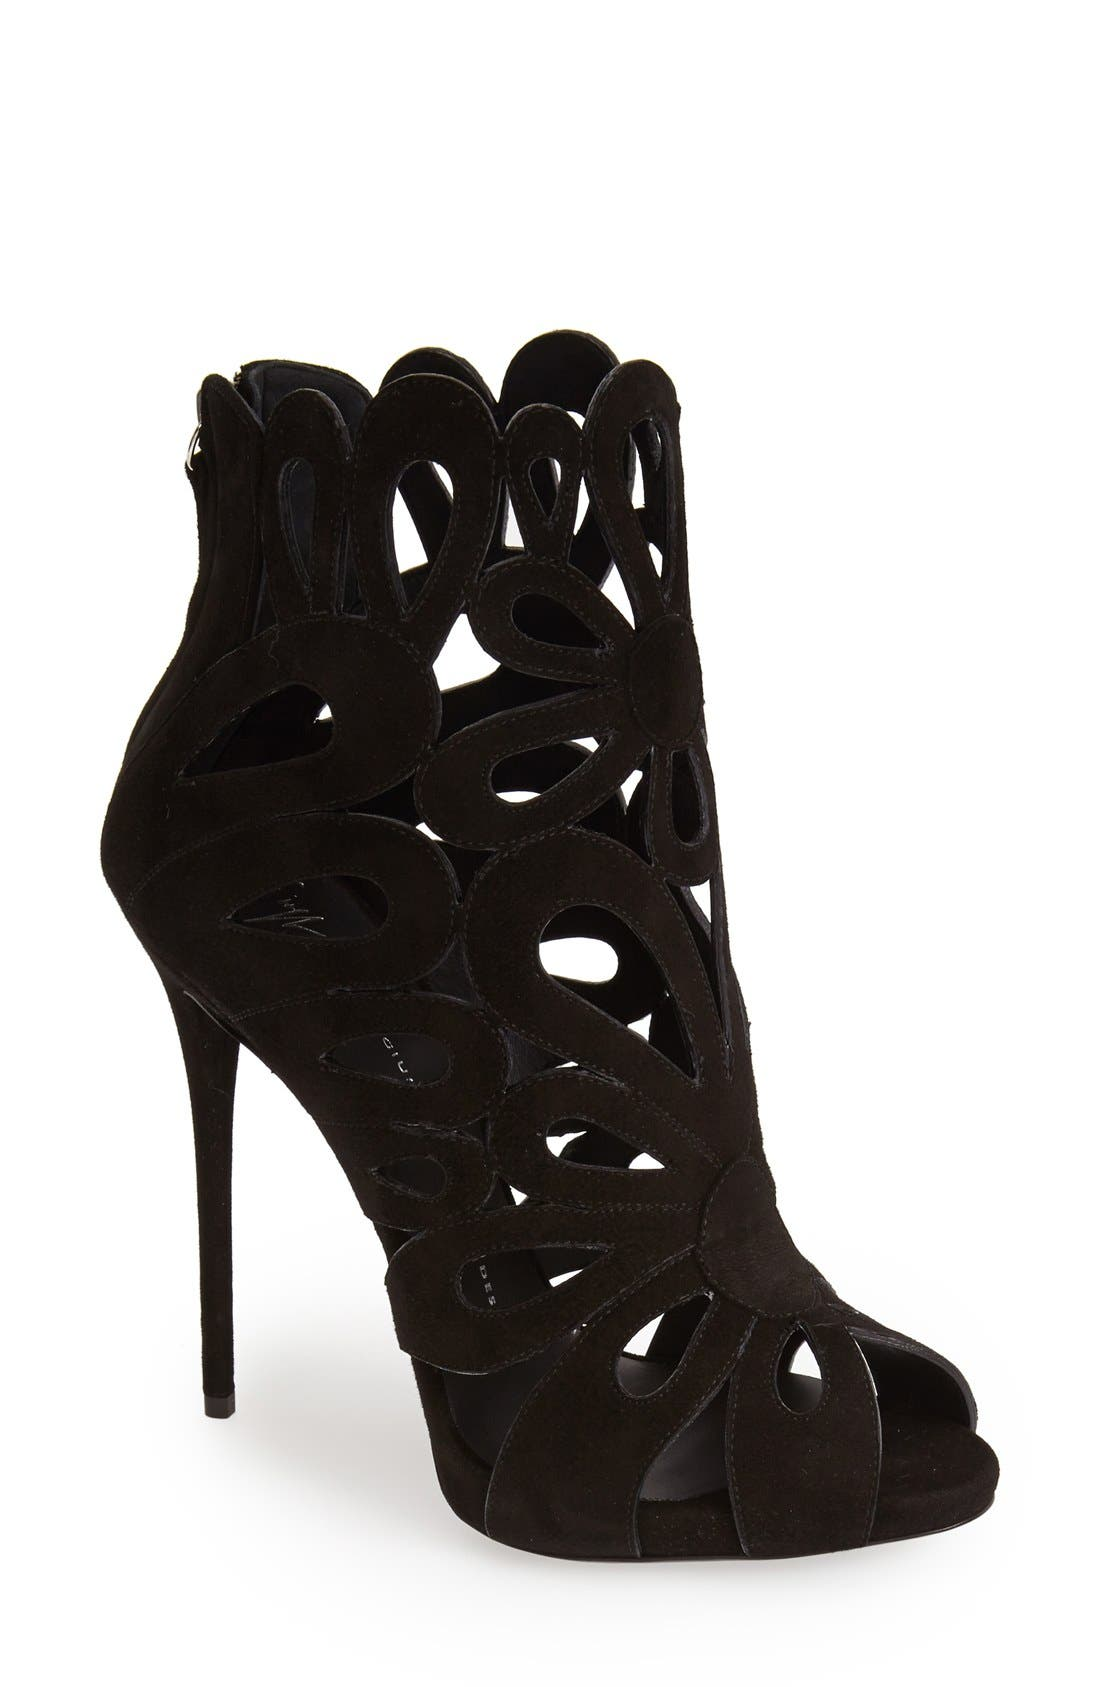 Main Image - Giuseppe Zanotti 'Coline' Leather Cage Bootie (Women)